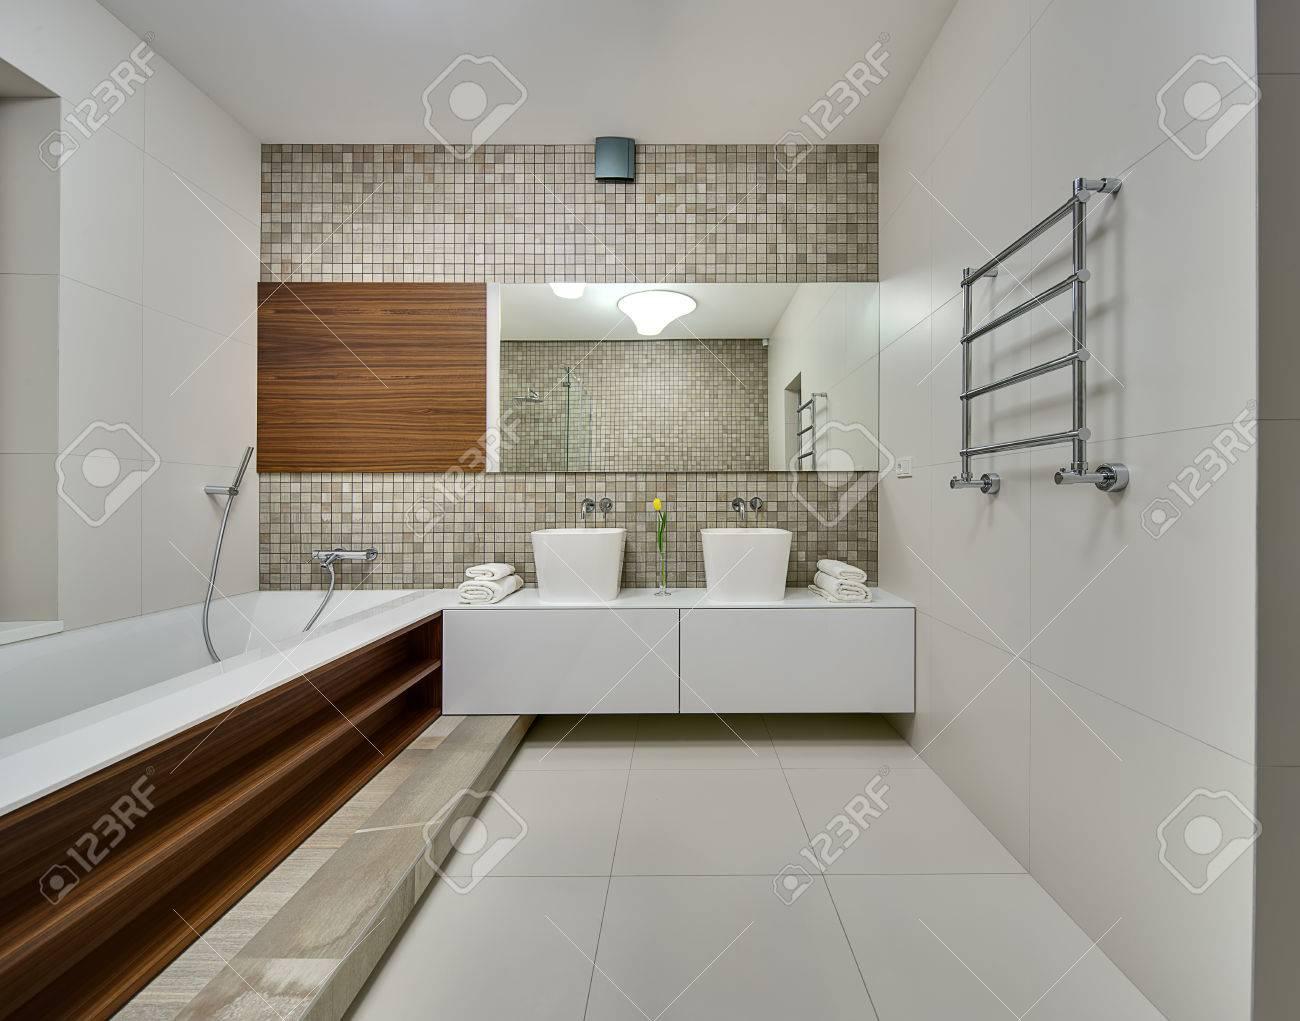 Piastrelle bagno legno d rendering bianco esagono piastrelle